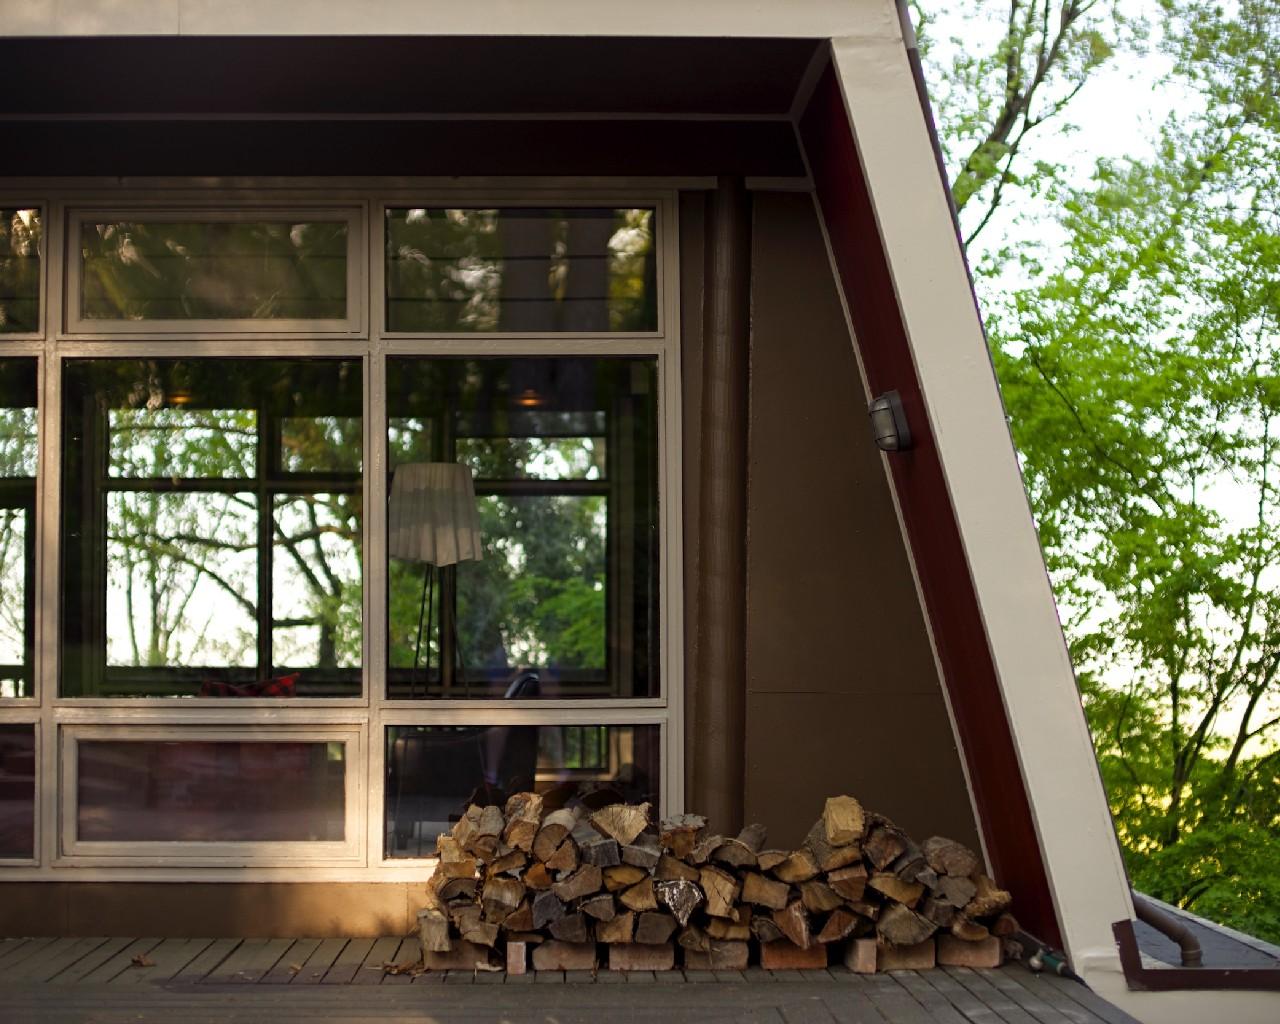 独户住宅 为 出租 在 Mid-Century Contemporary 28 Mountainside Park Ter 蒙特克莱尔, 07042 美国